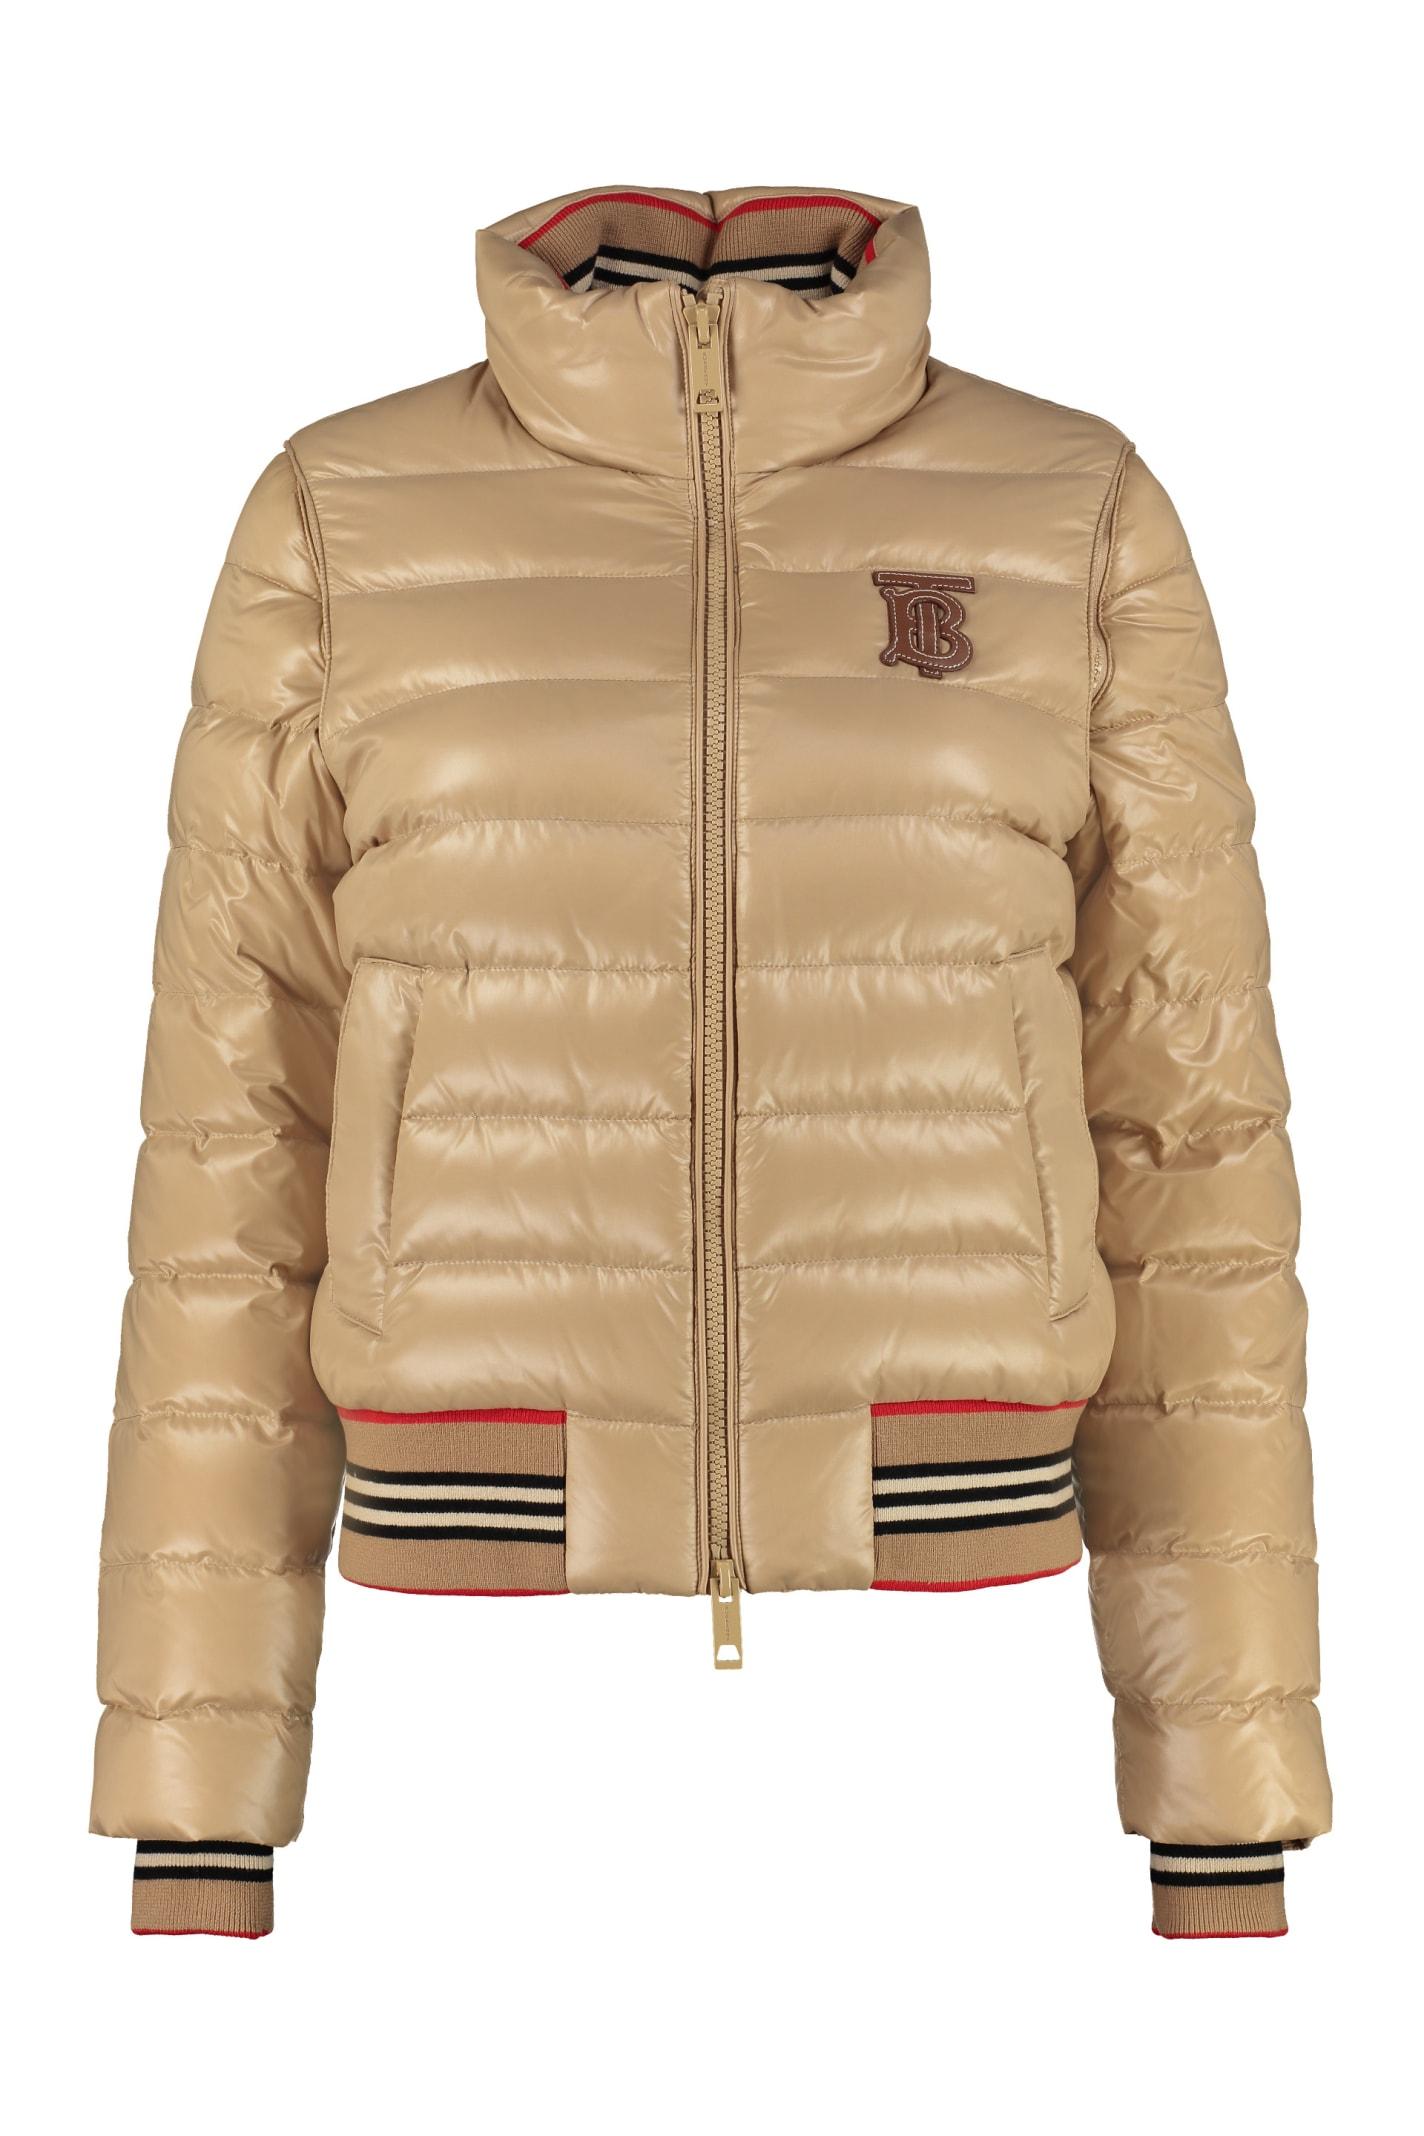 Burberry Detachable Sleeves Down Jacket